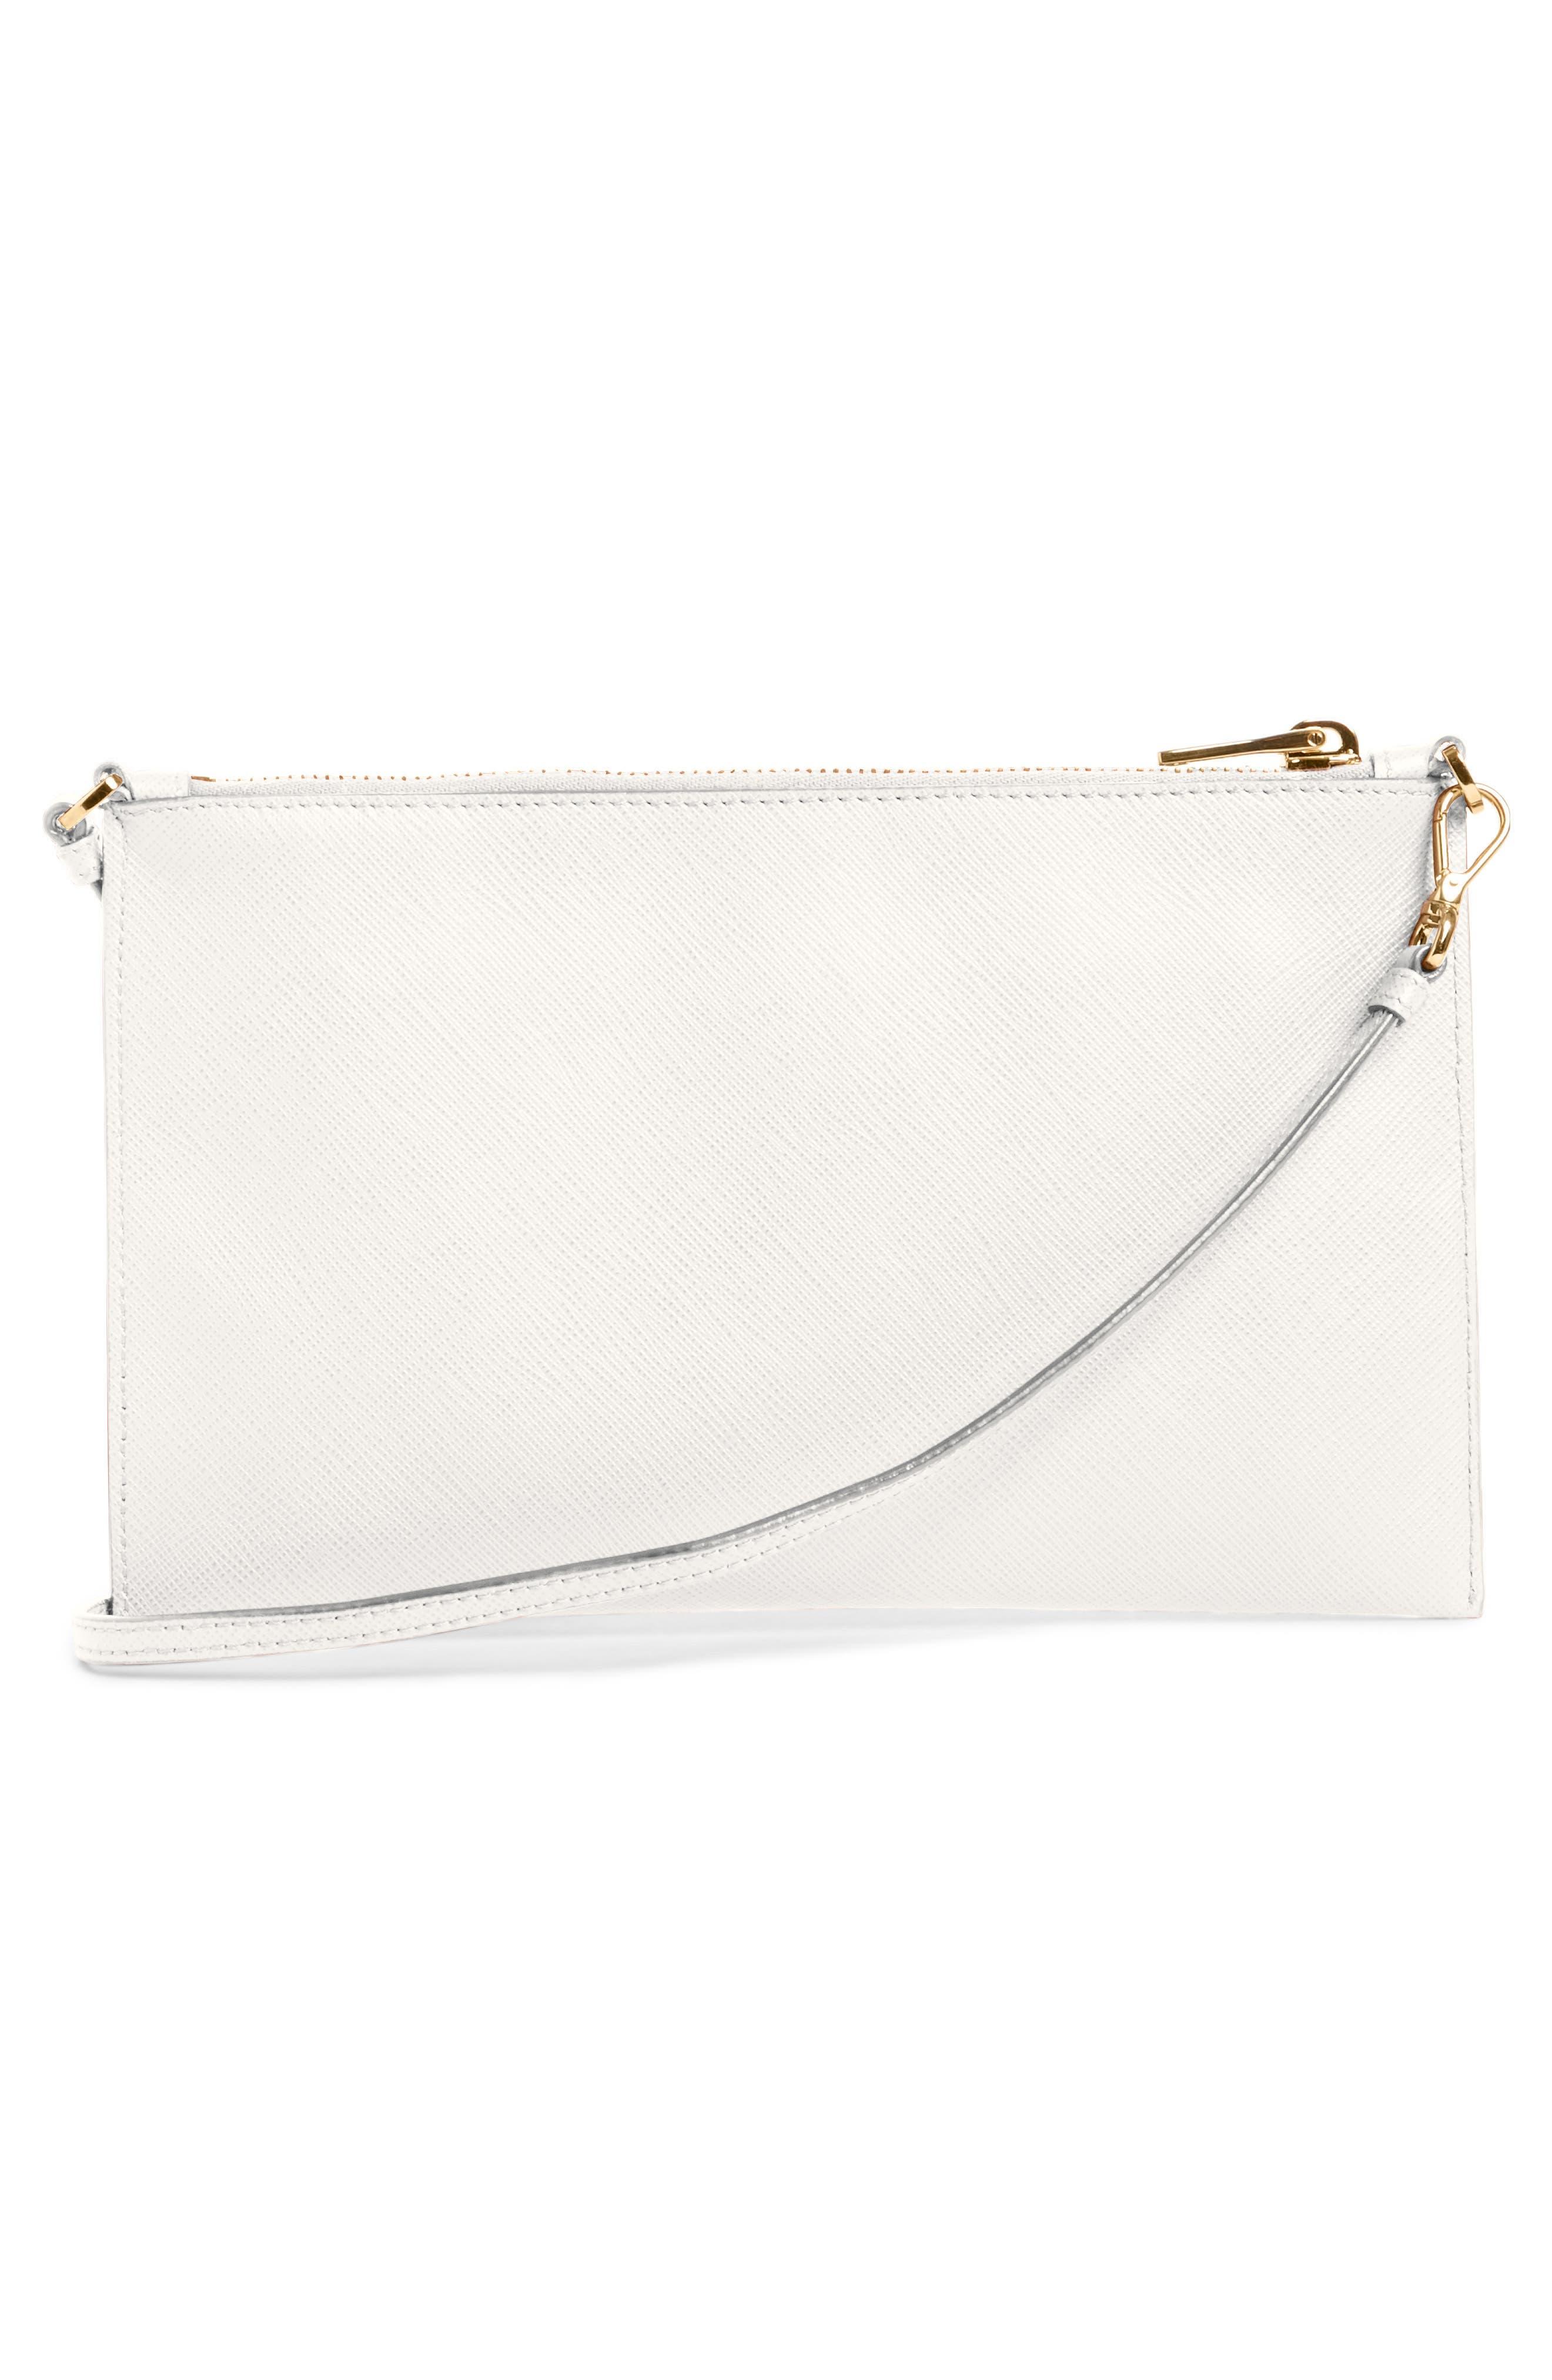 Saffiano Leather Shoulder Bag,                             Alternate thumbnail 3, color,                             F0009 Bianco